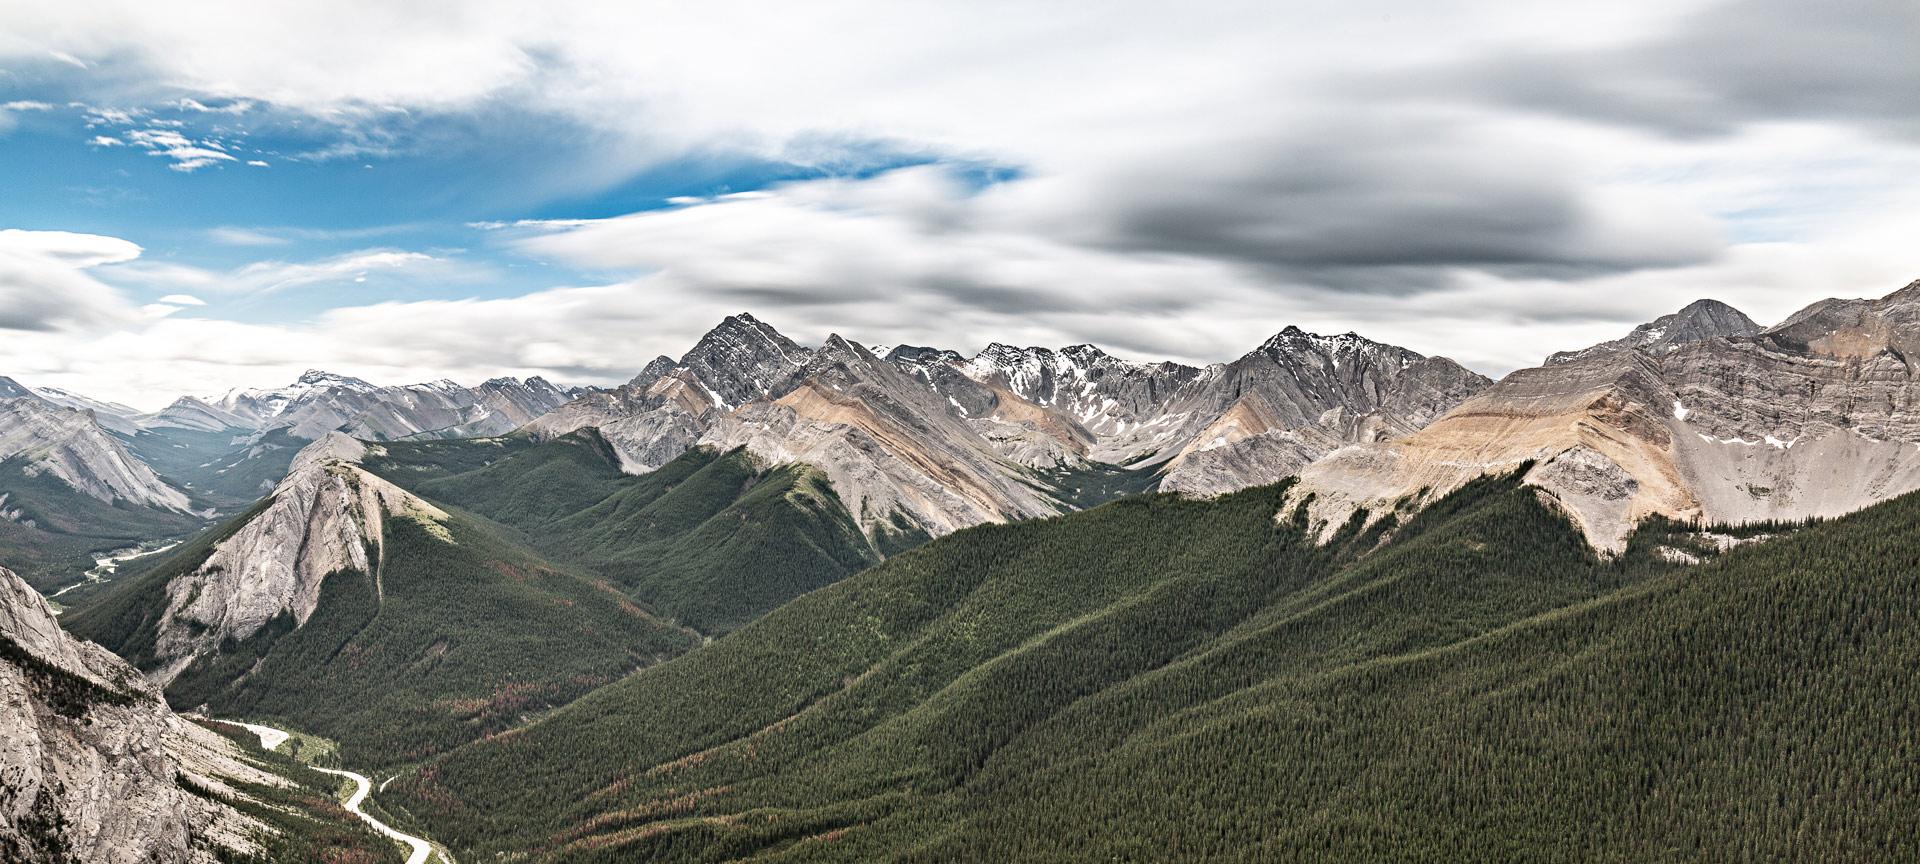 Sulphur Skyline Trail Jasper Canada